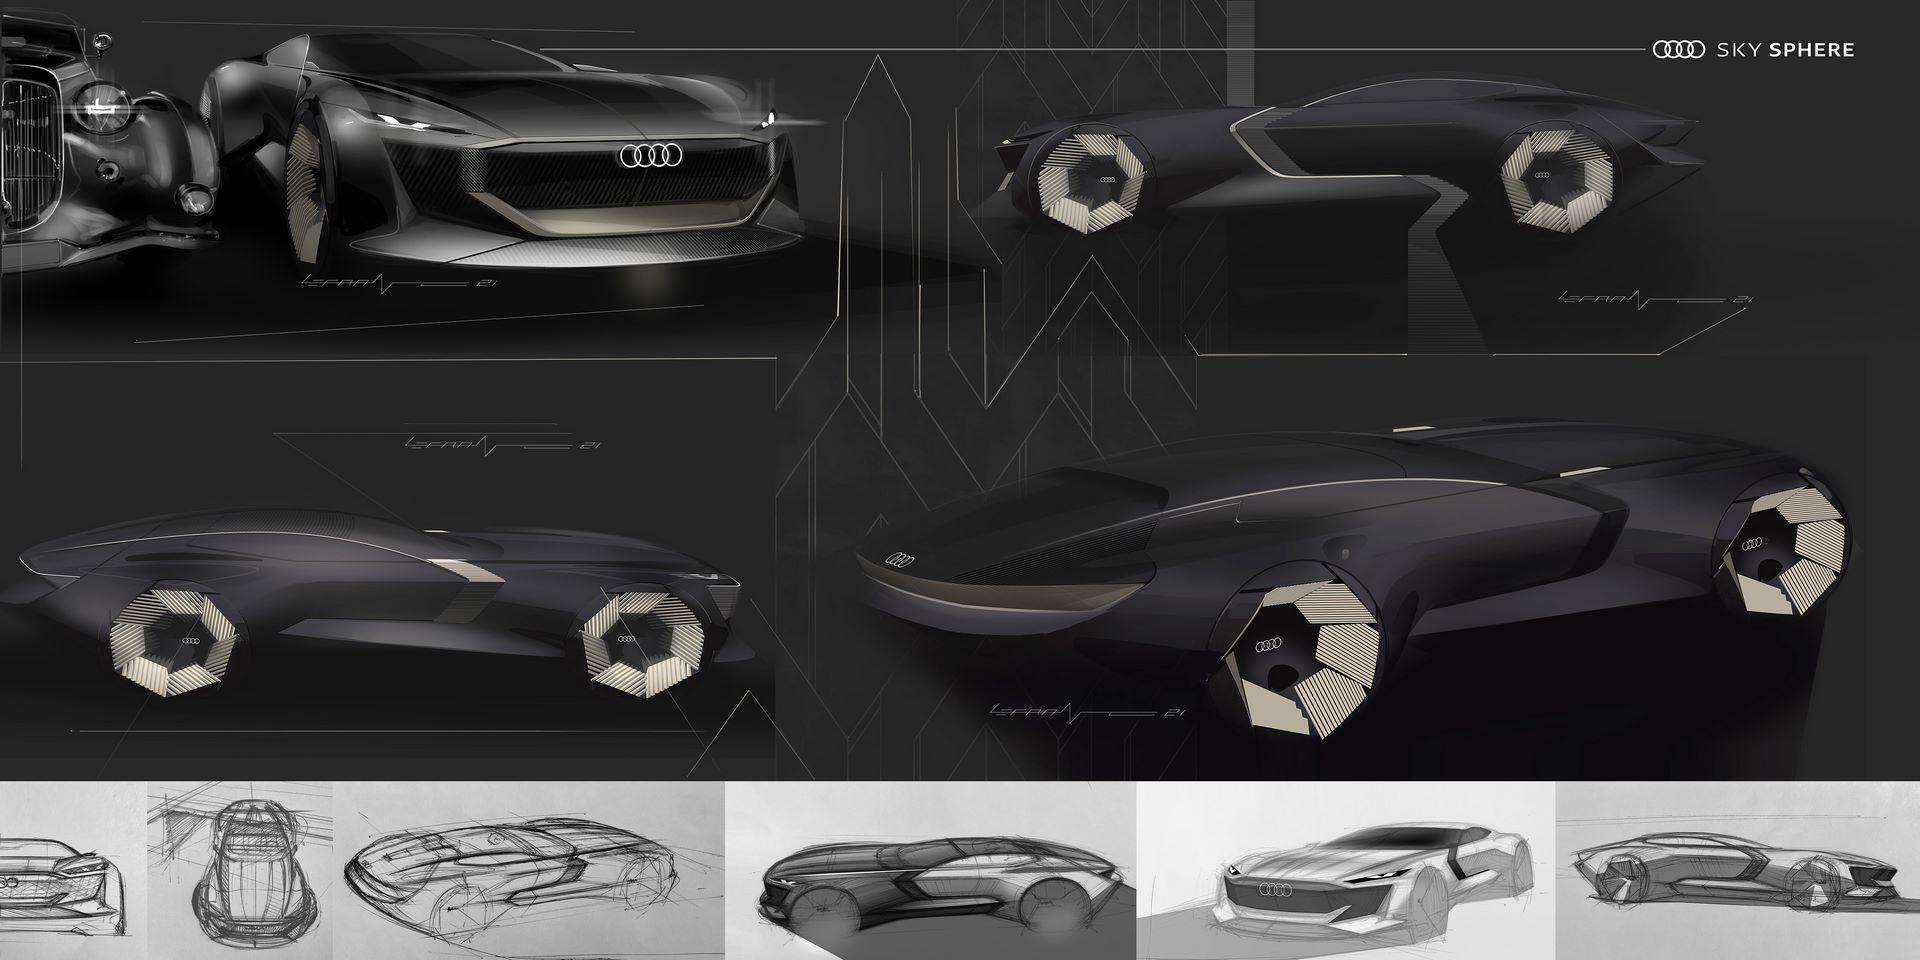 Audi-Skysphere-Concept-33